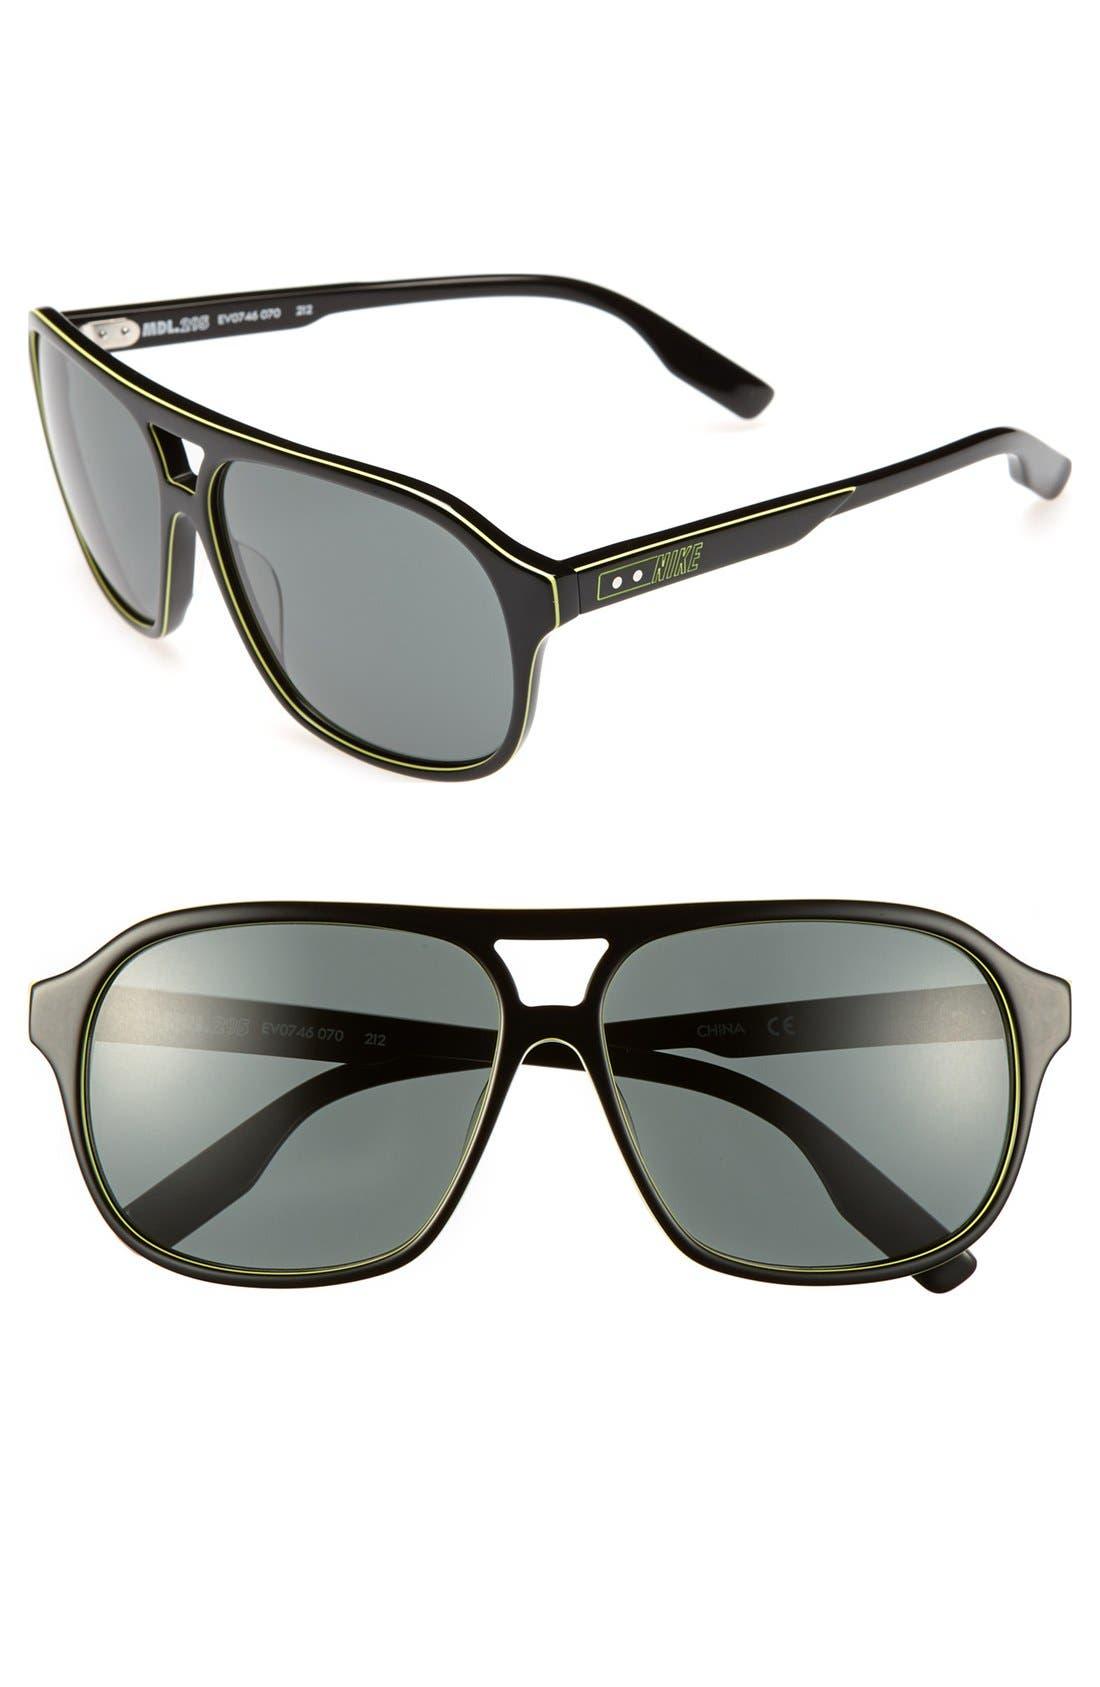 Alternate Image 1 Selected - Nike 'MDL.295' 59mm Sunglasses